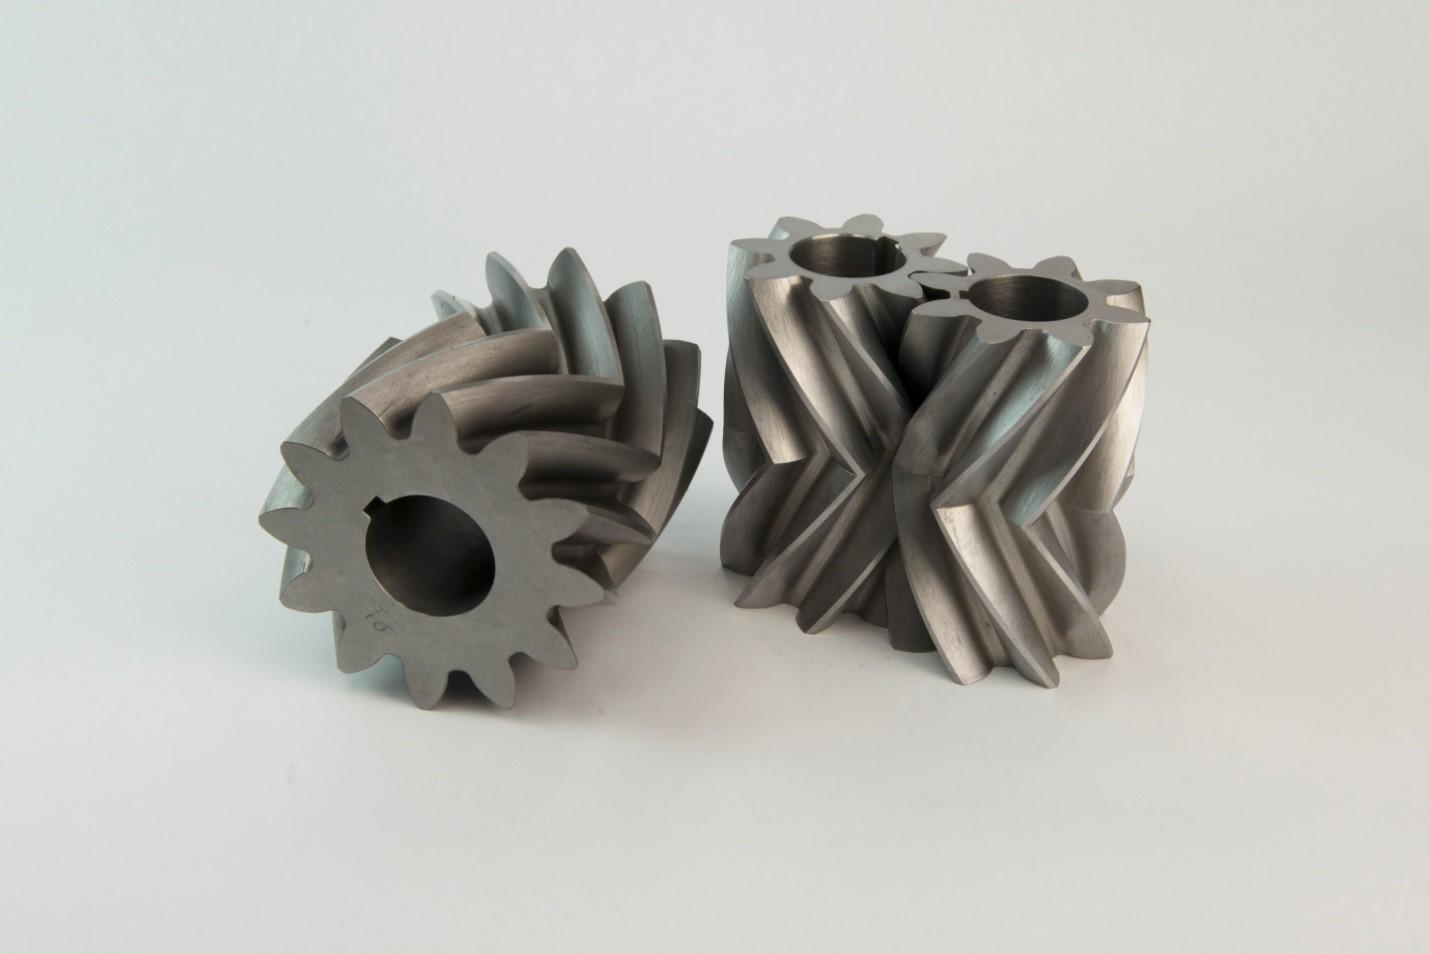 Herringbone gear pumps